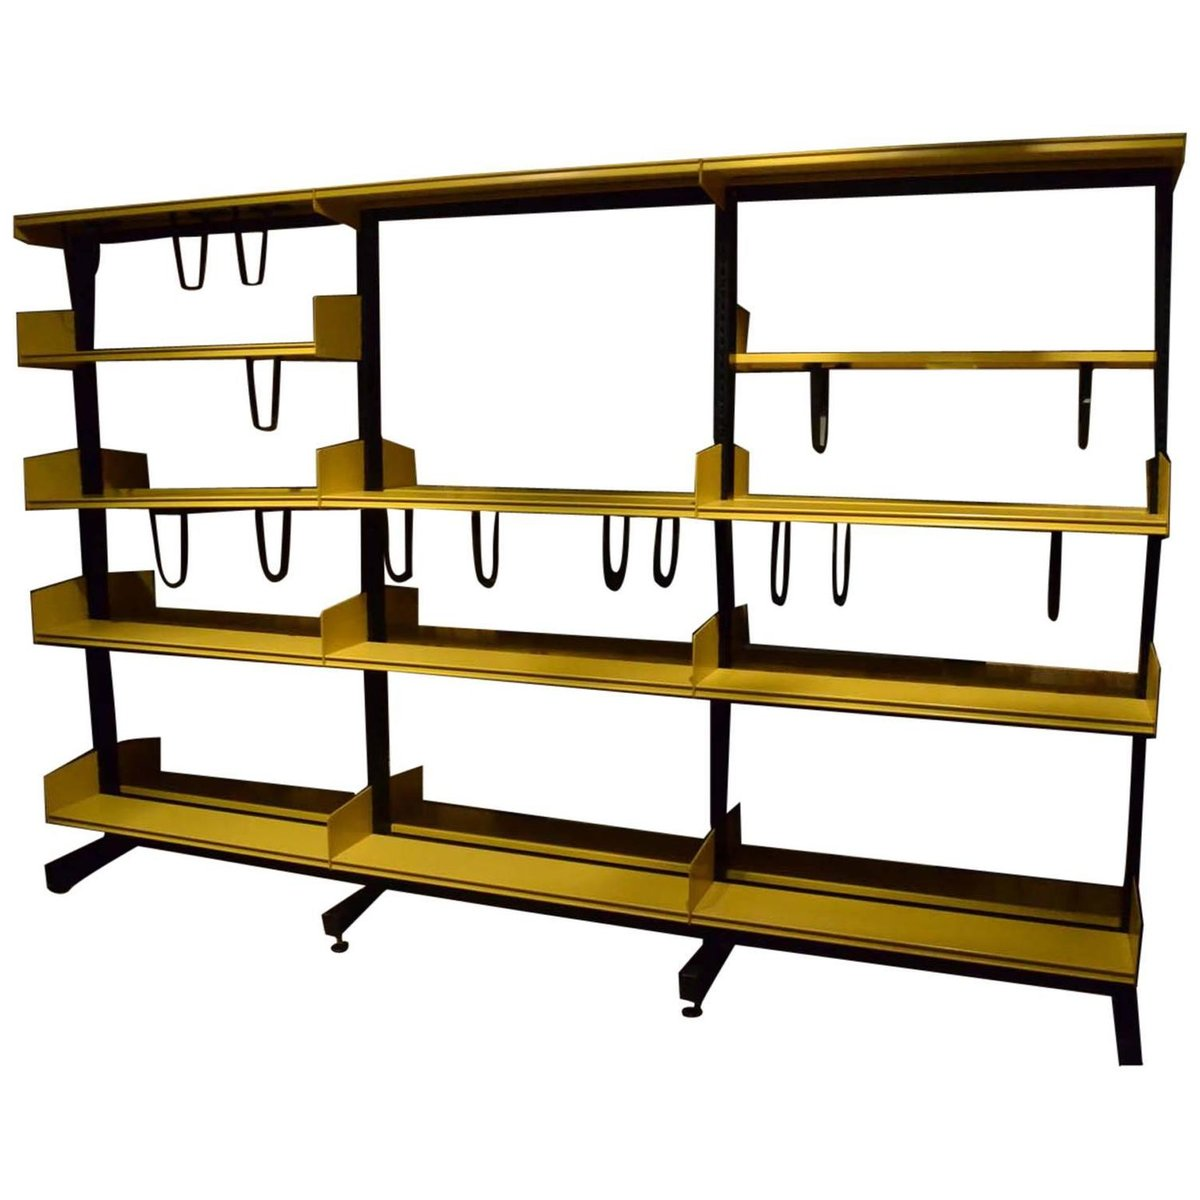 modulares vintage regalsystem in gelb schwarz von. Black Bedroom Furniture Sets. Home Design Ideas